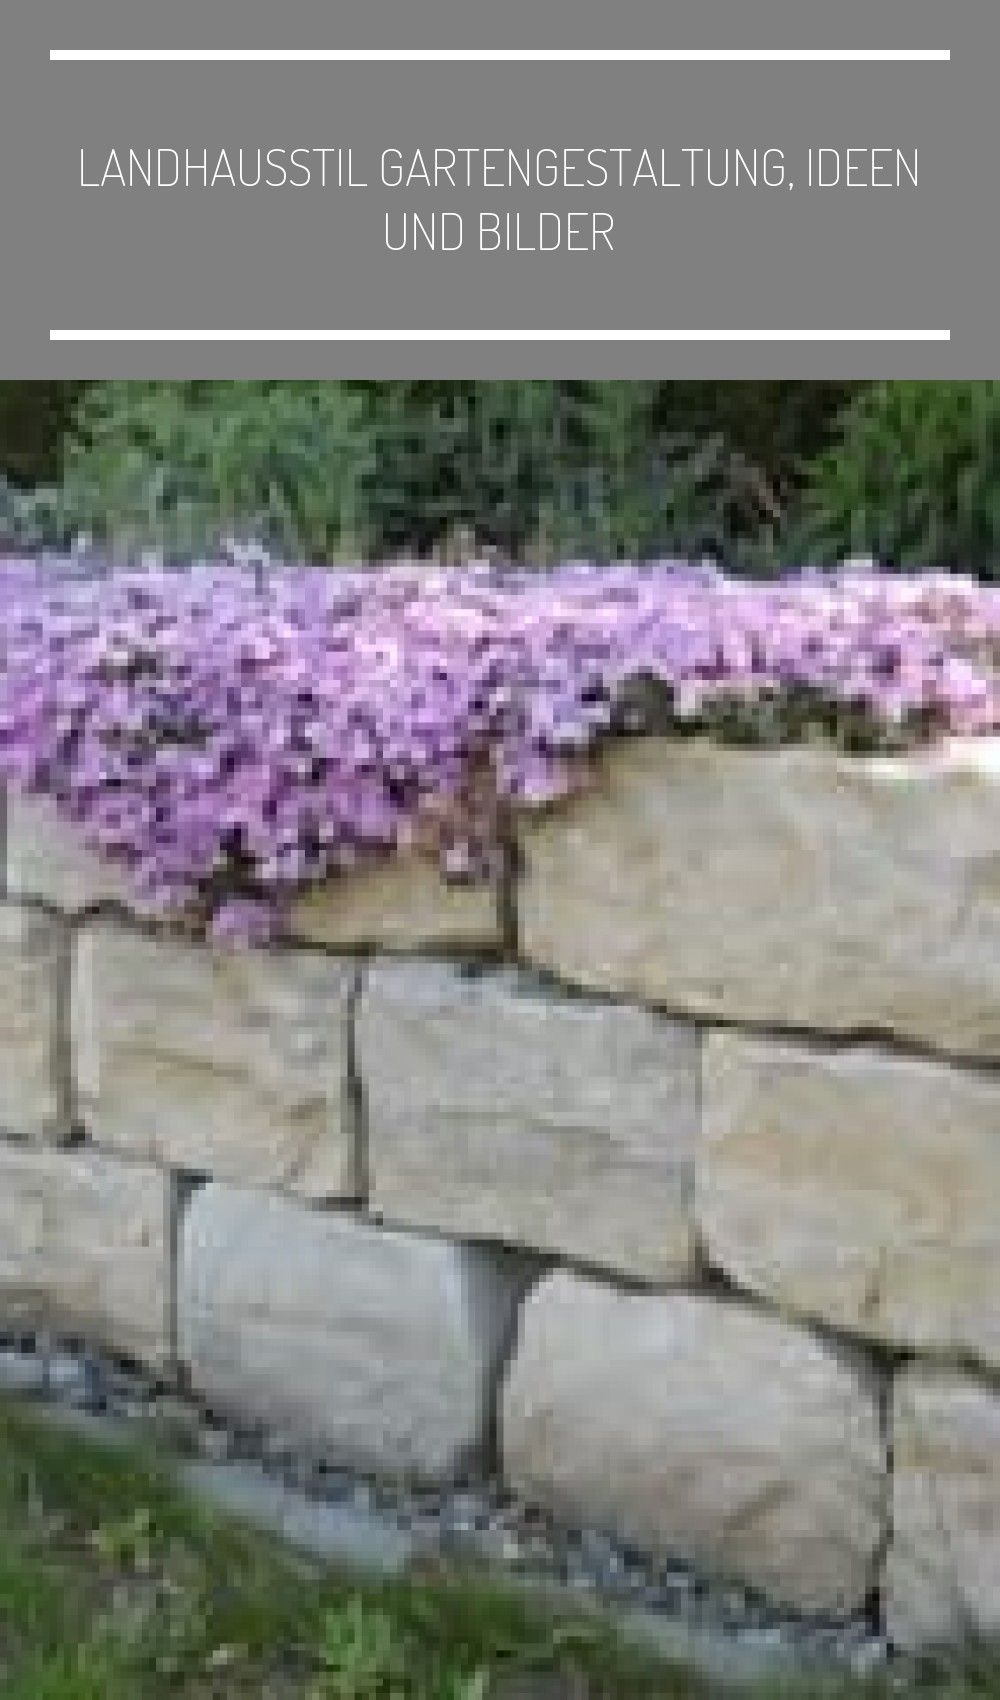 Landhausstil Gartengestaltung En 2020 Walle